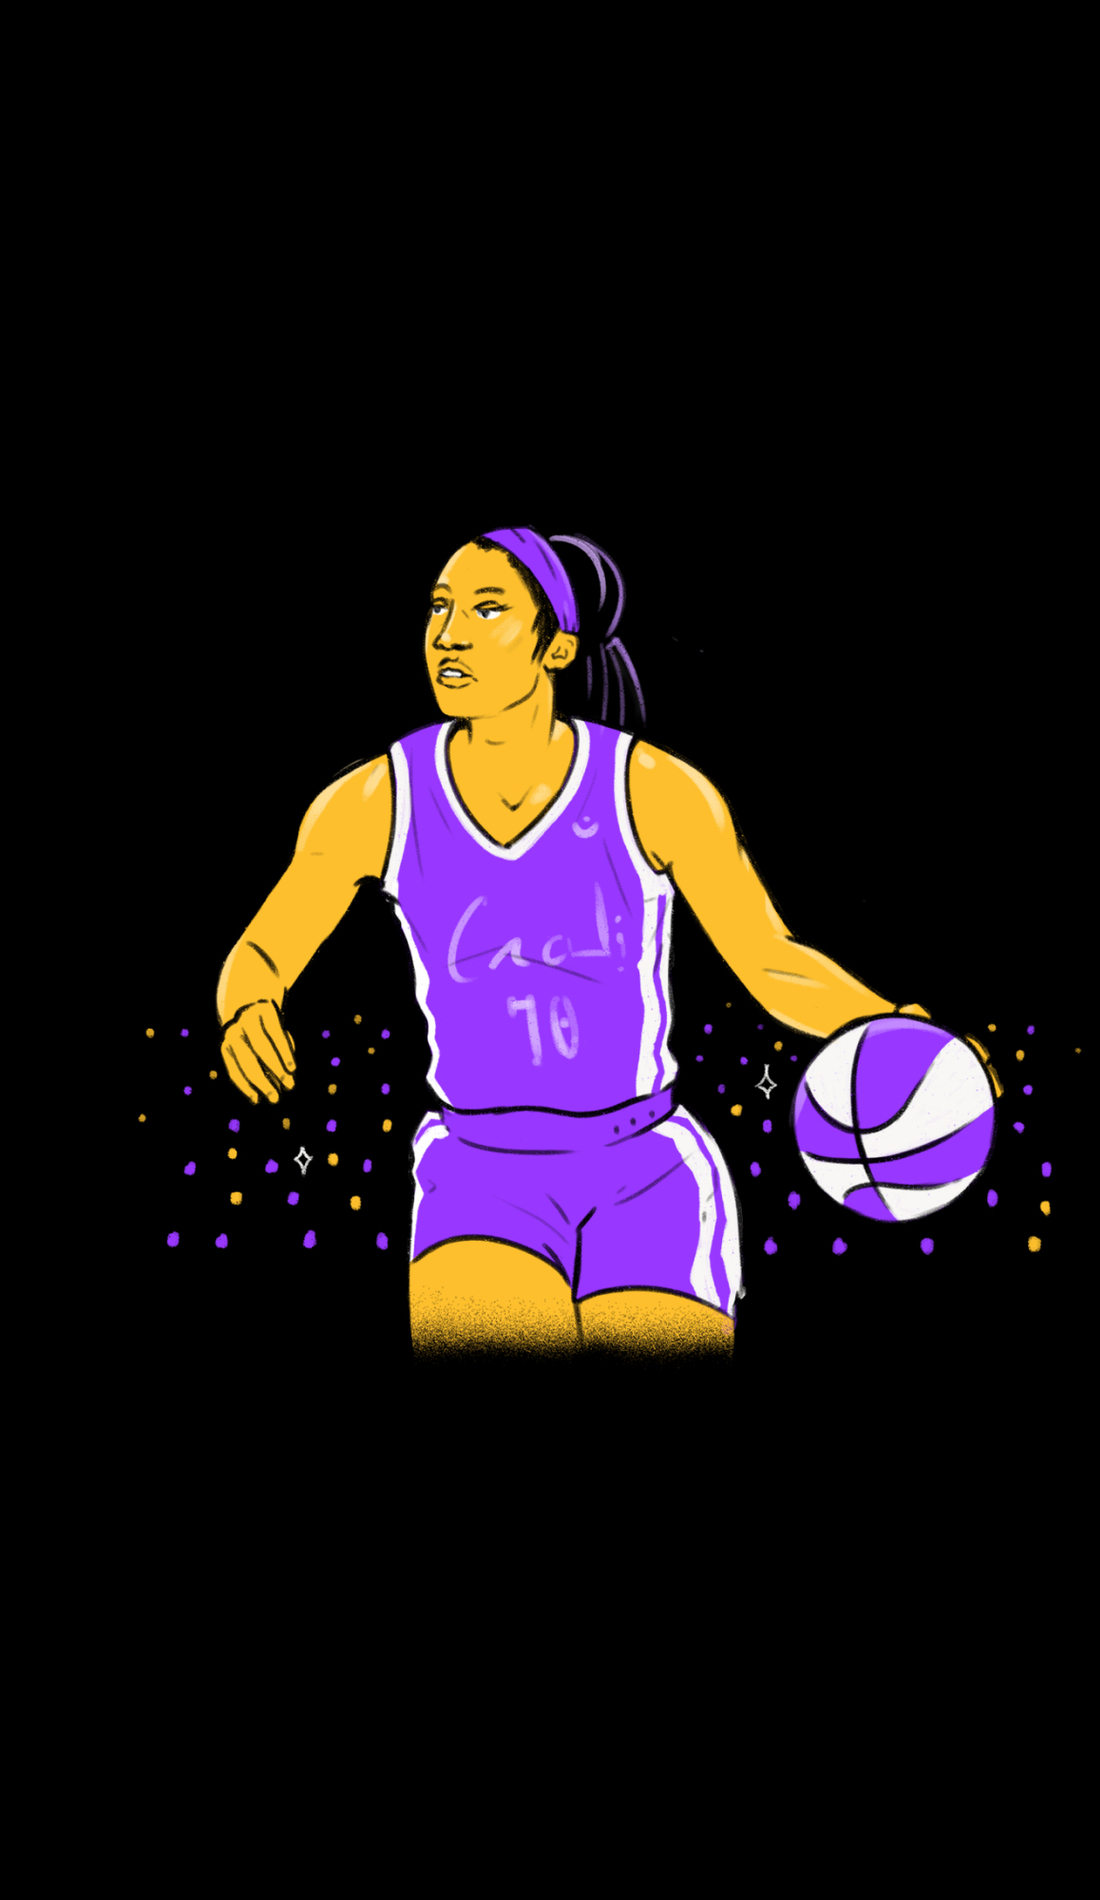 A Chattanooga Mocs Womens Basketball live event